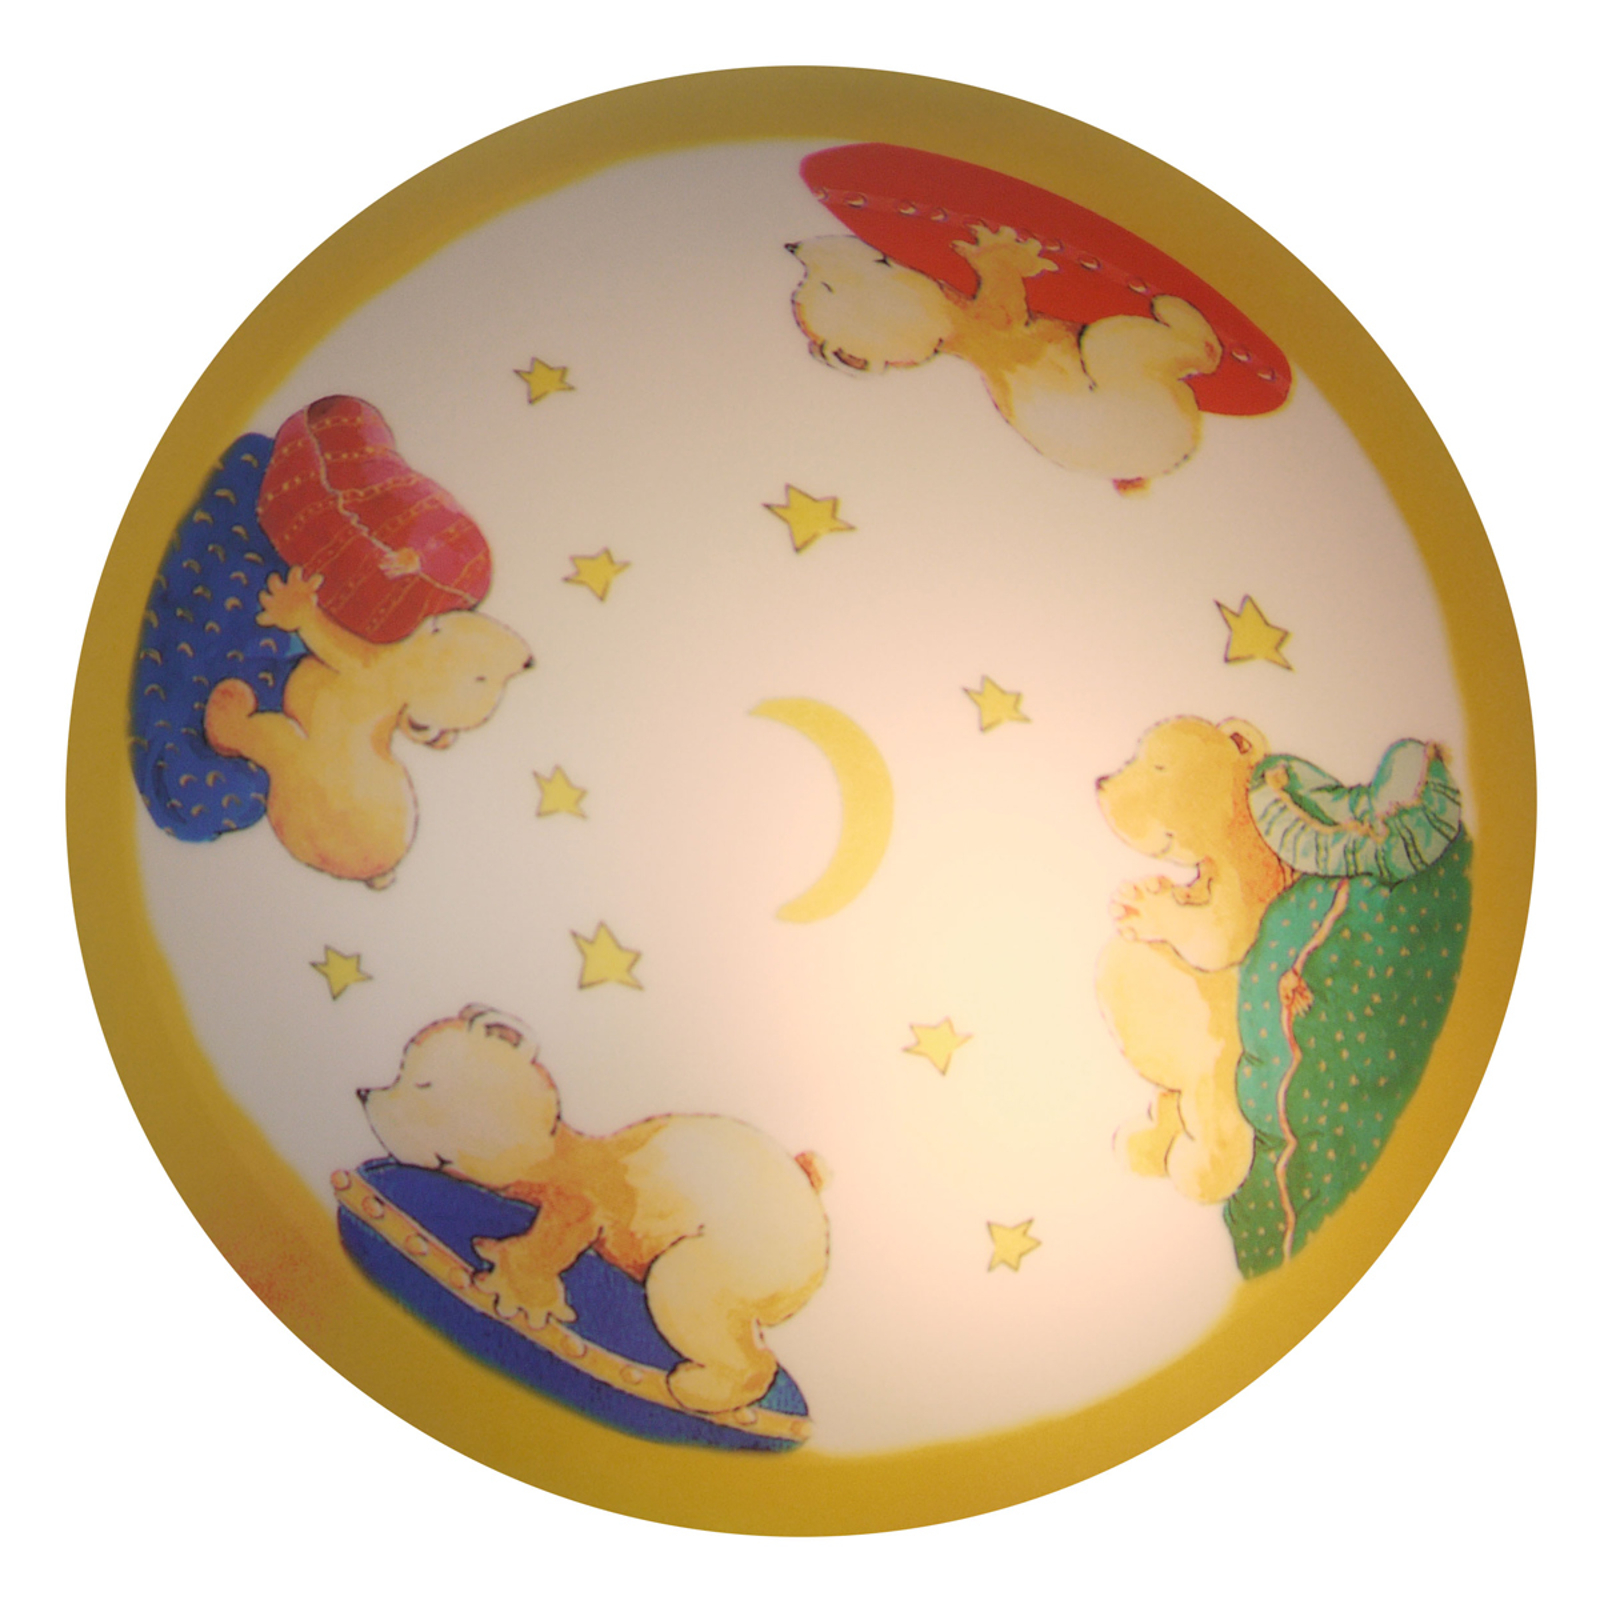 Bear Berni - sød loftlampe til børneværelset